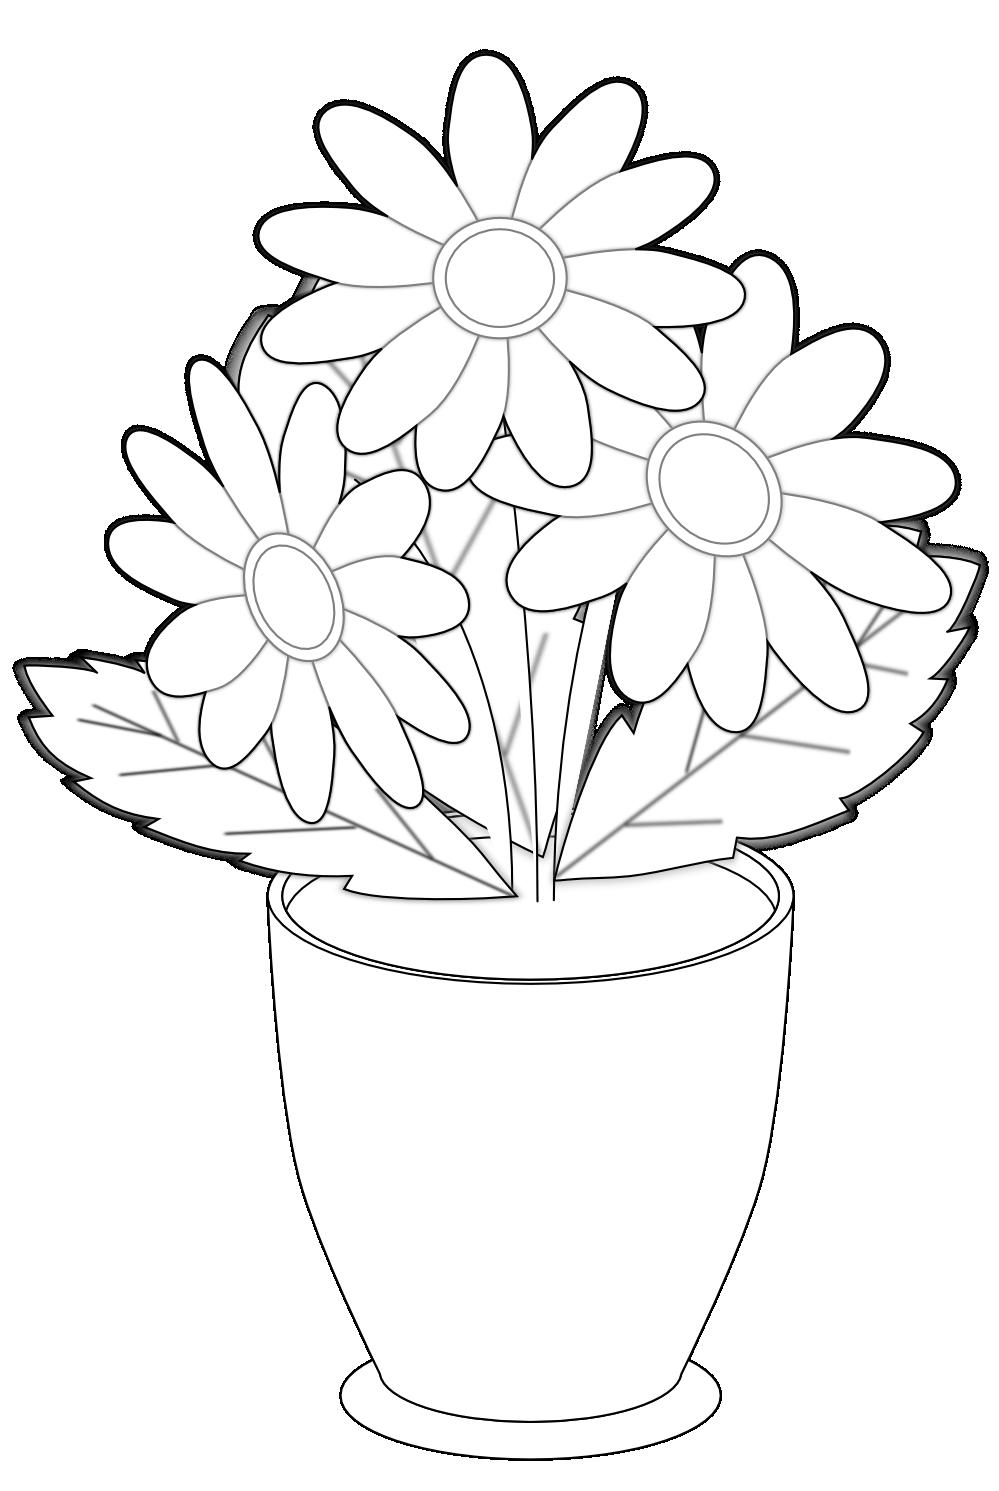 Flower vase png black and white transparent flower vase black and black and white flower vase flower vase png black and white mightylinksfo